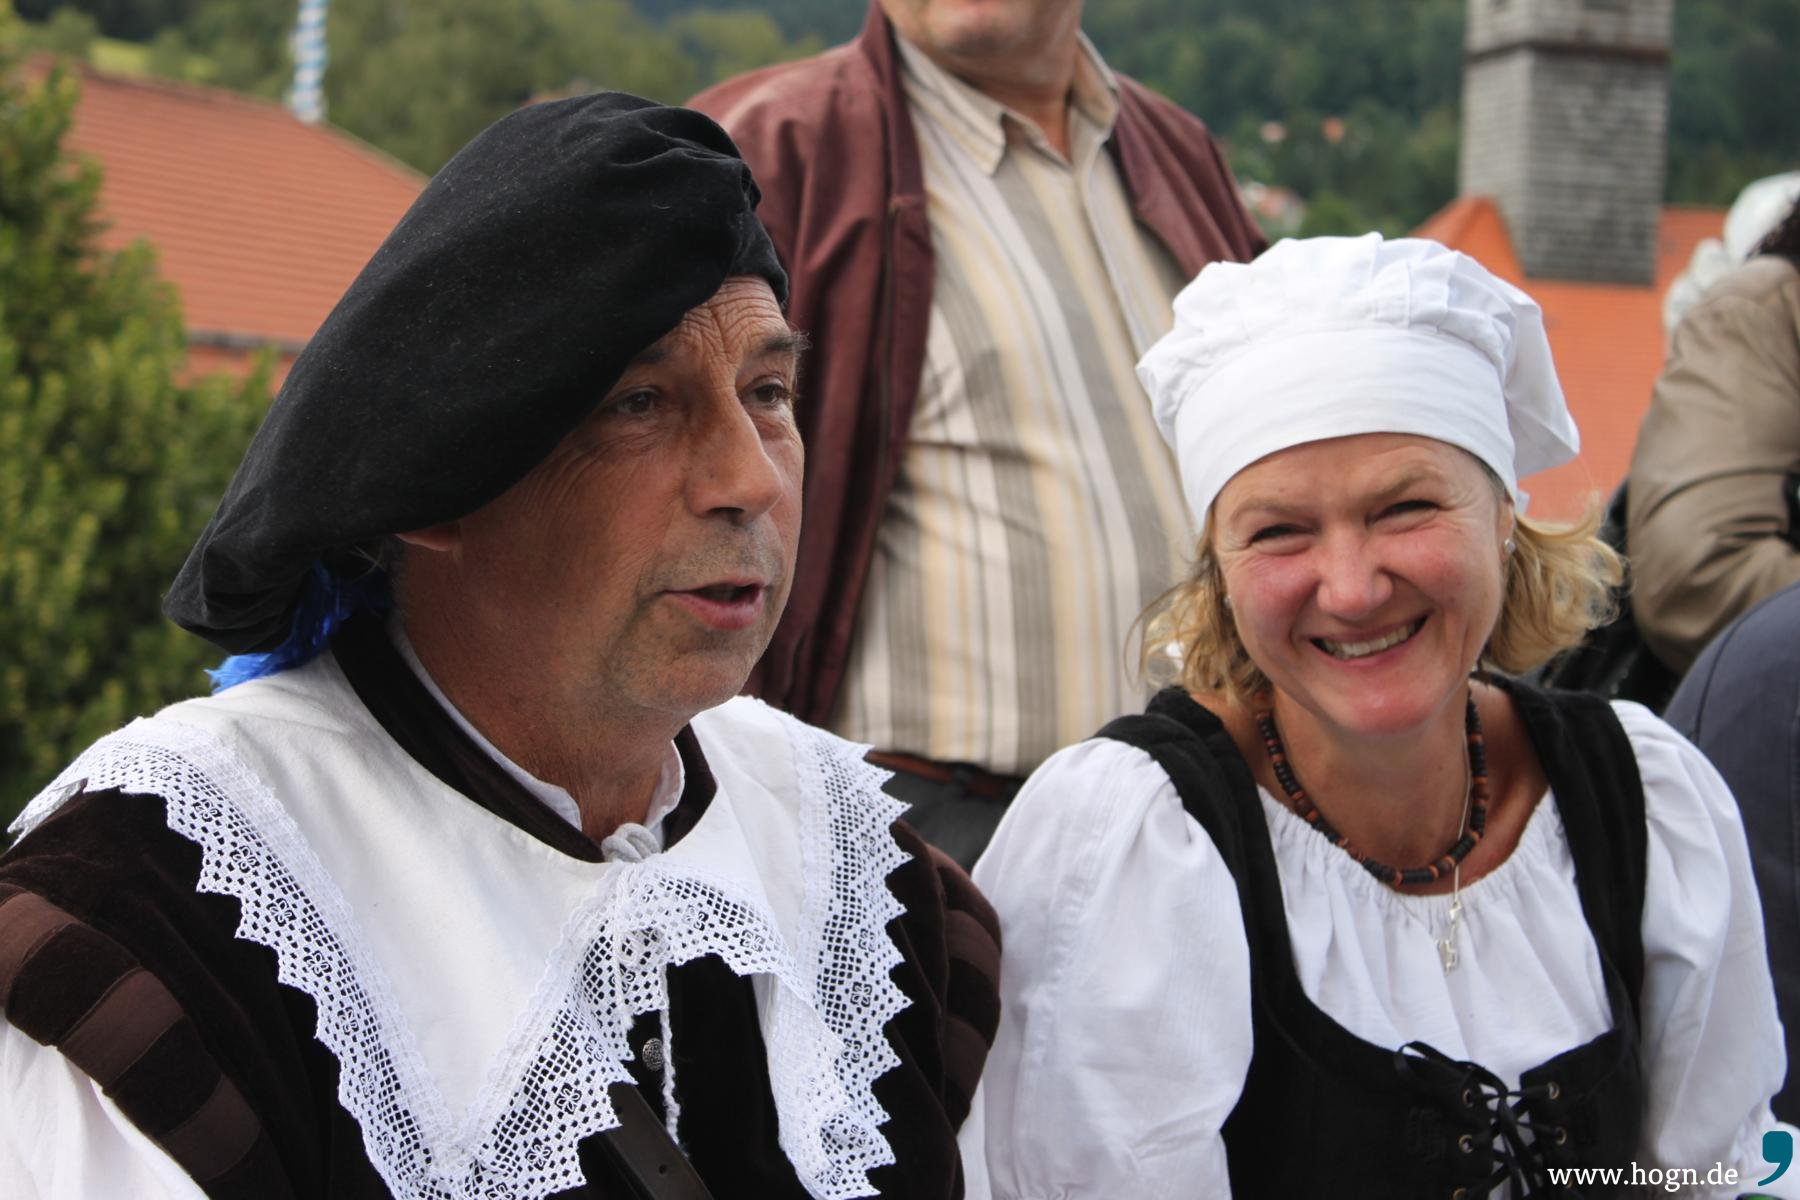 saeumferfest-2012-19